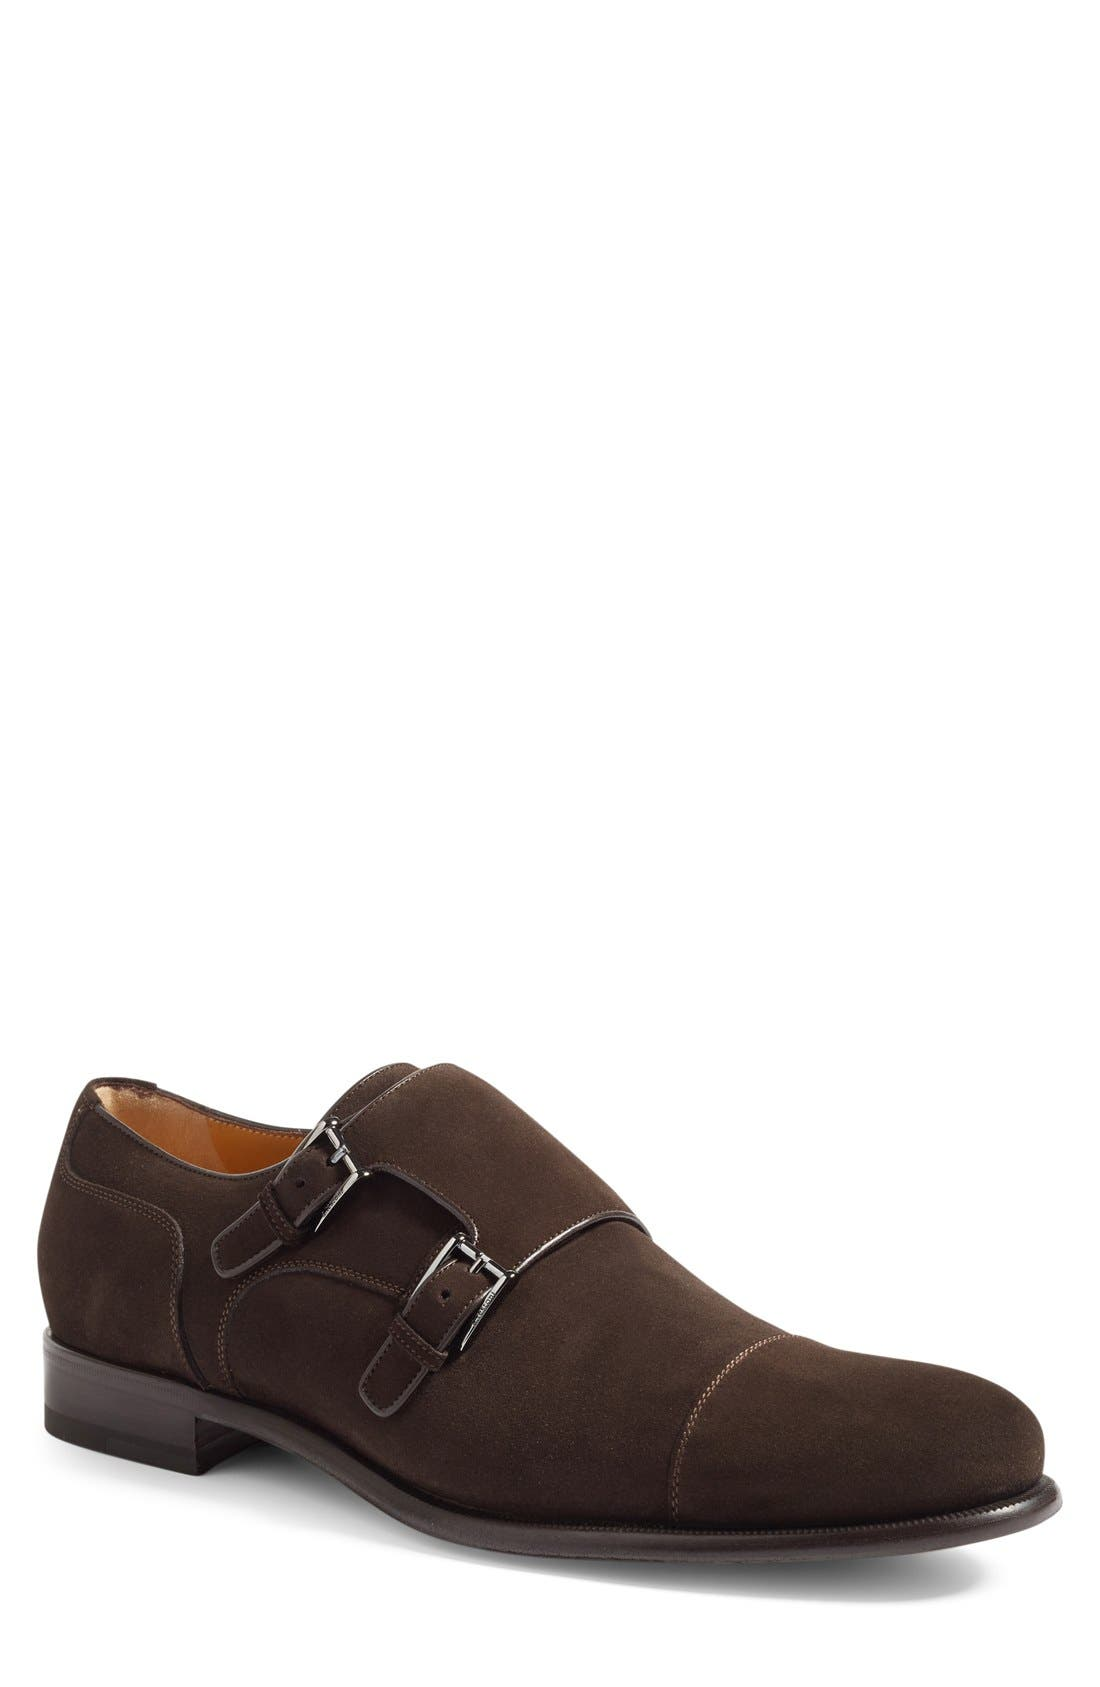 Alternate Image 1 Selected - A. Testoni Double Monk Strap Shoe (Men)